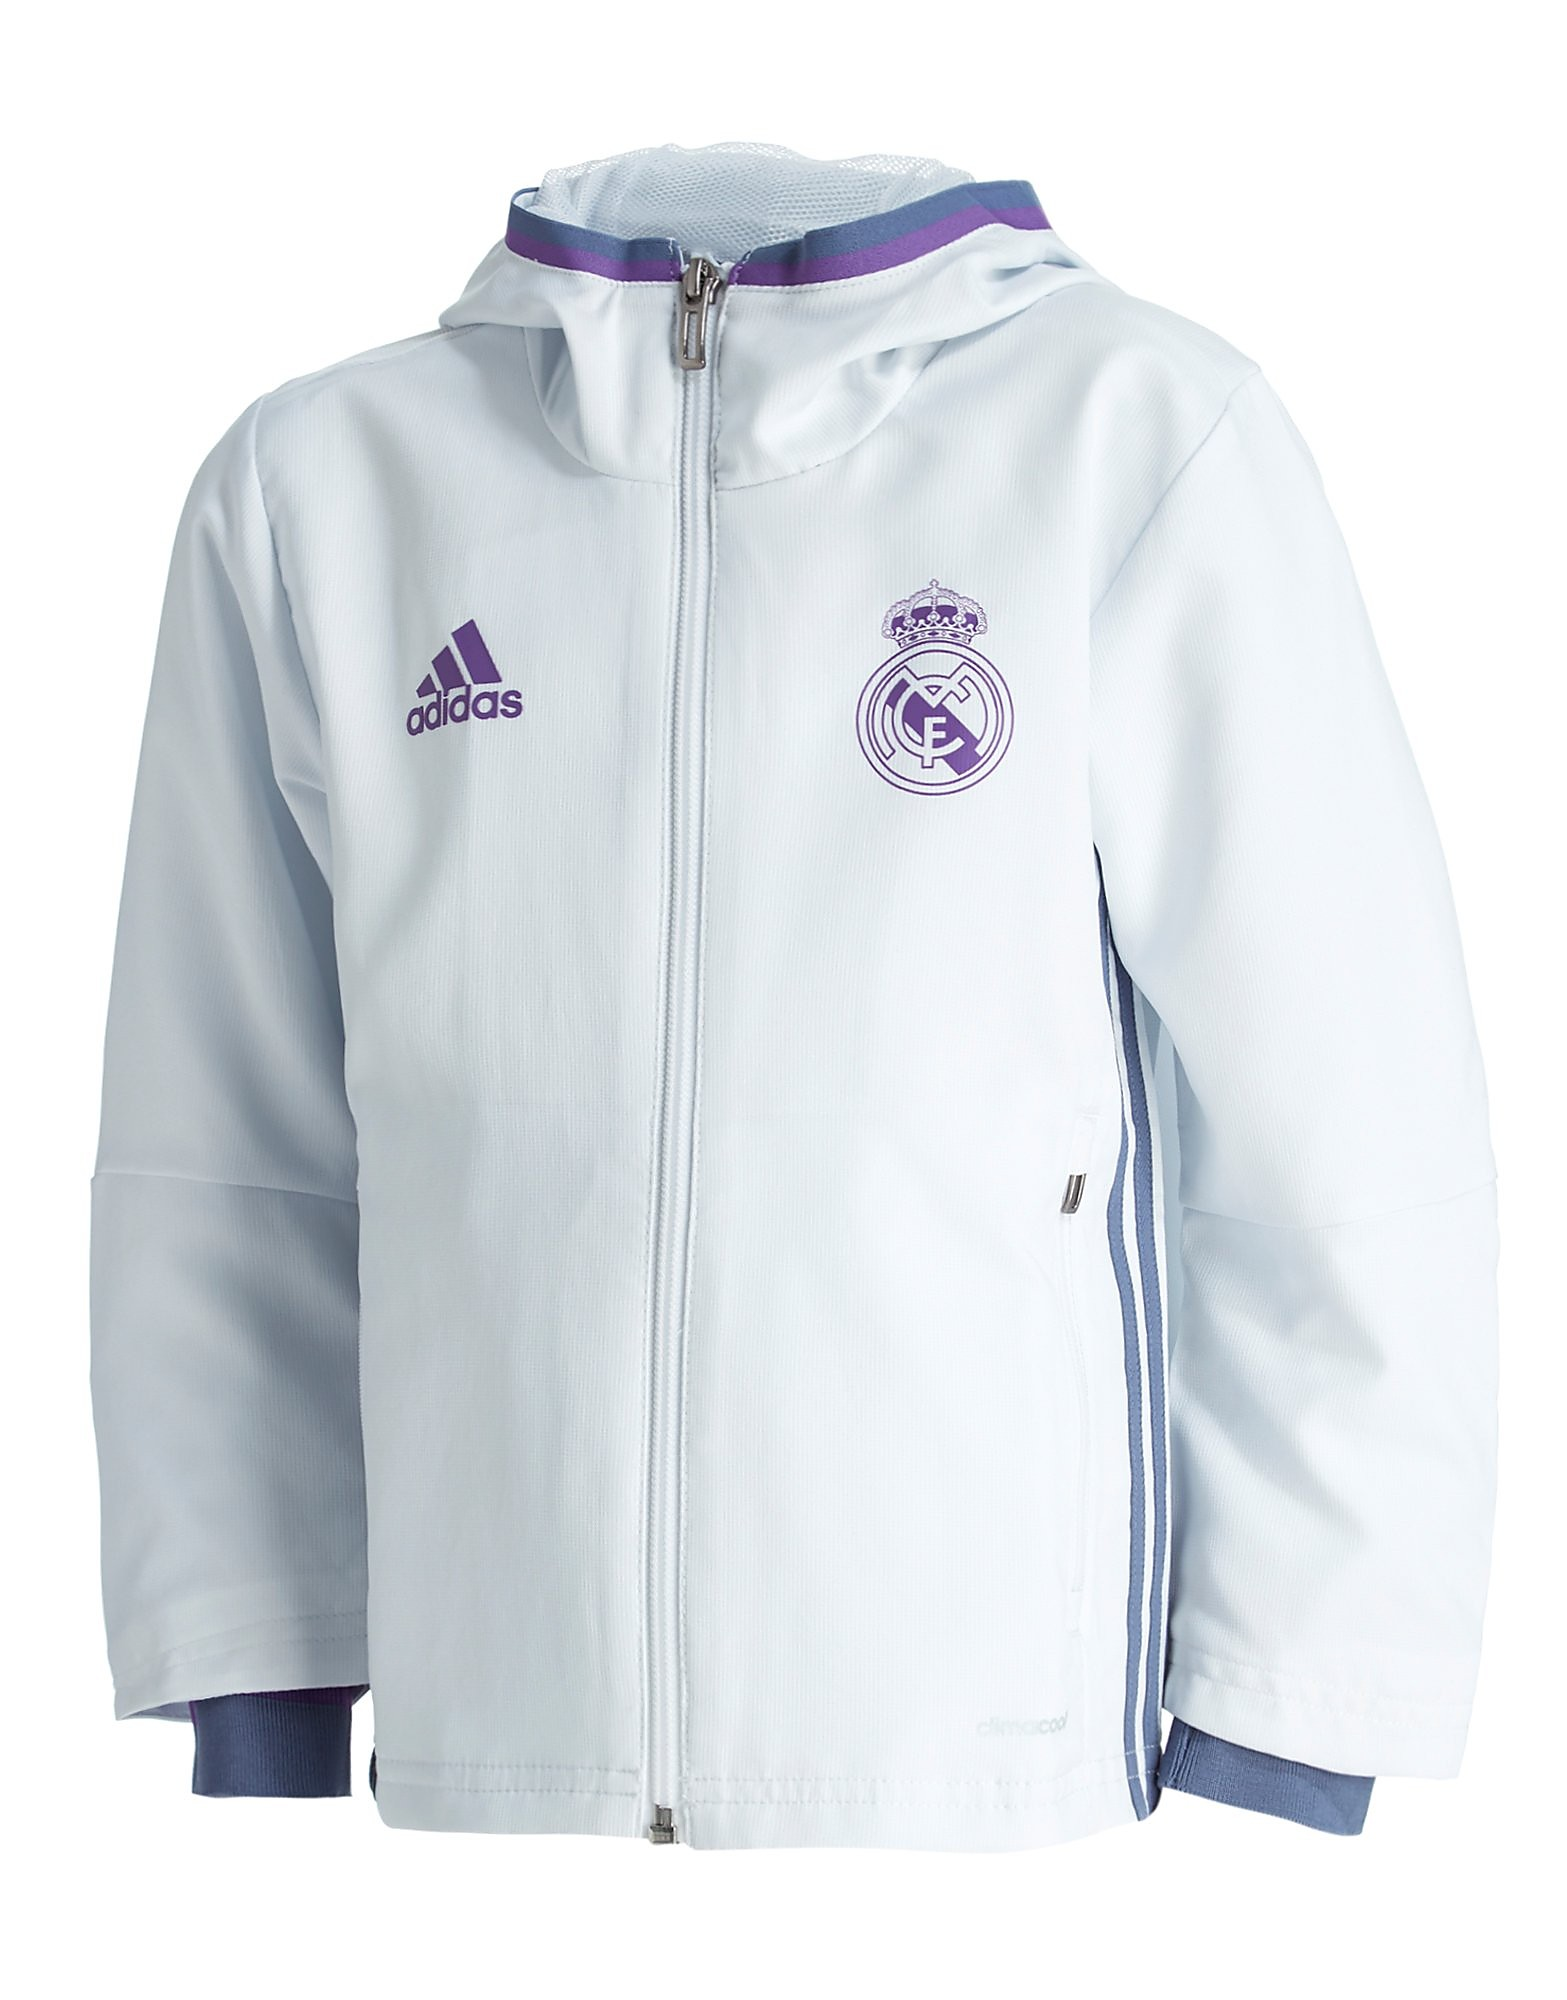 adidas Real Madrid 2016 Presentation Suit Children